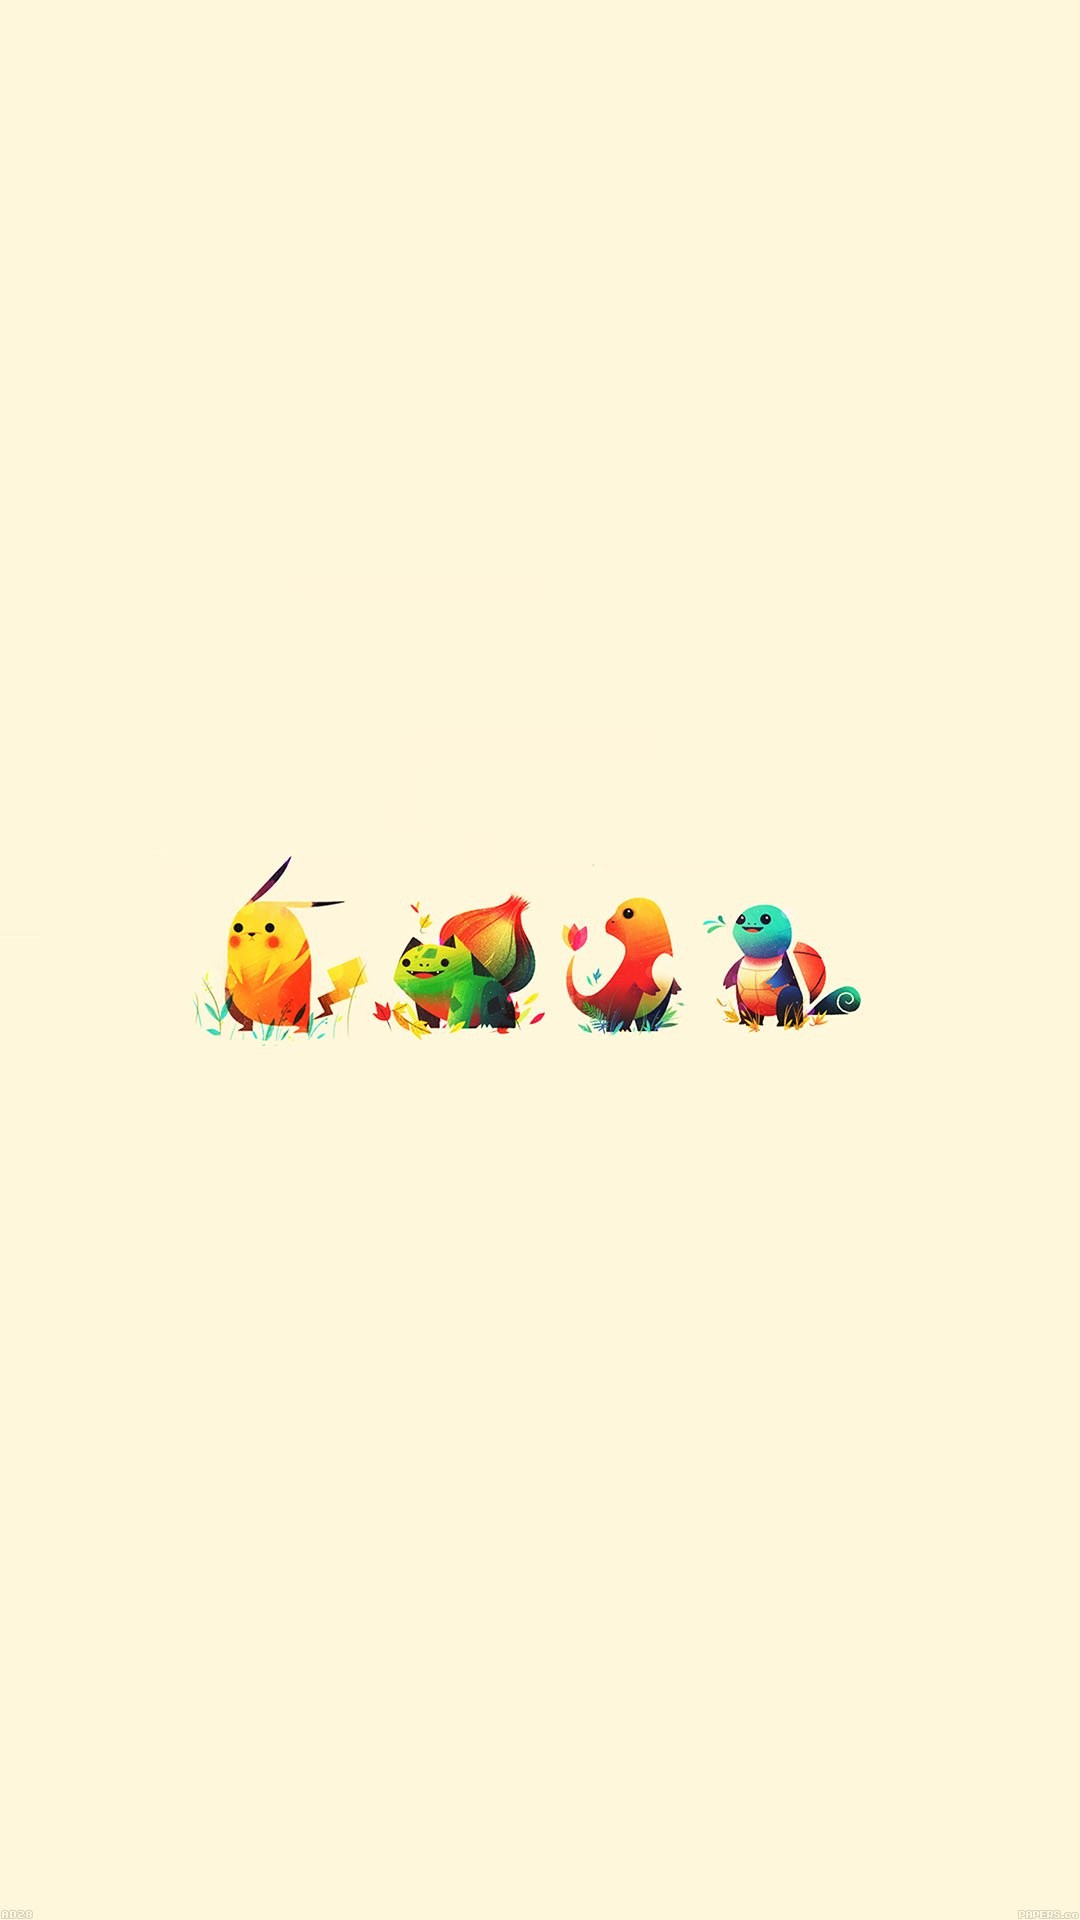 1490x2650 Cute Iphone 6 Wallpapers Tumblr Best Wallpaper